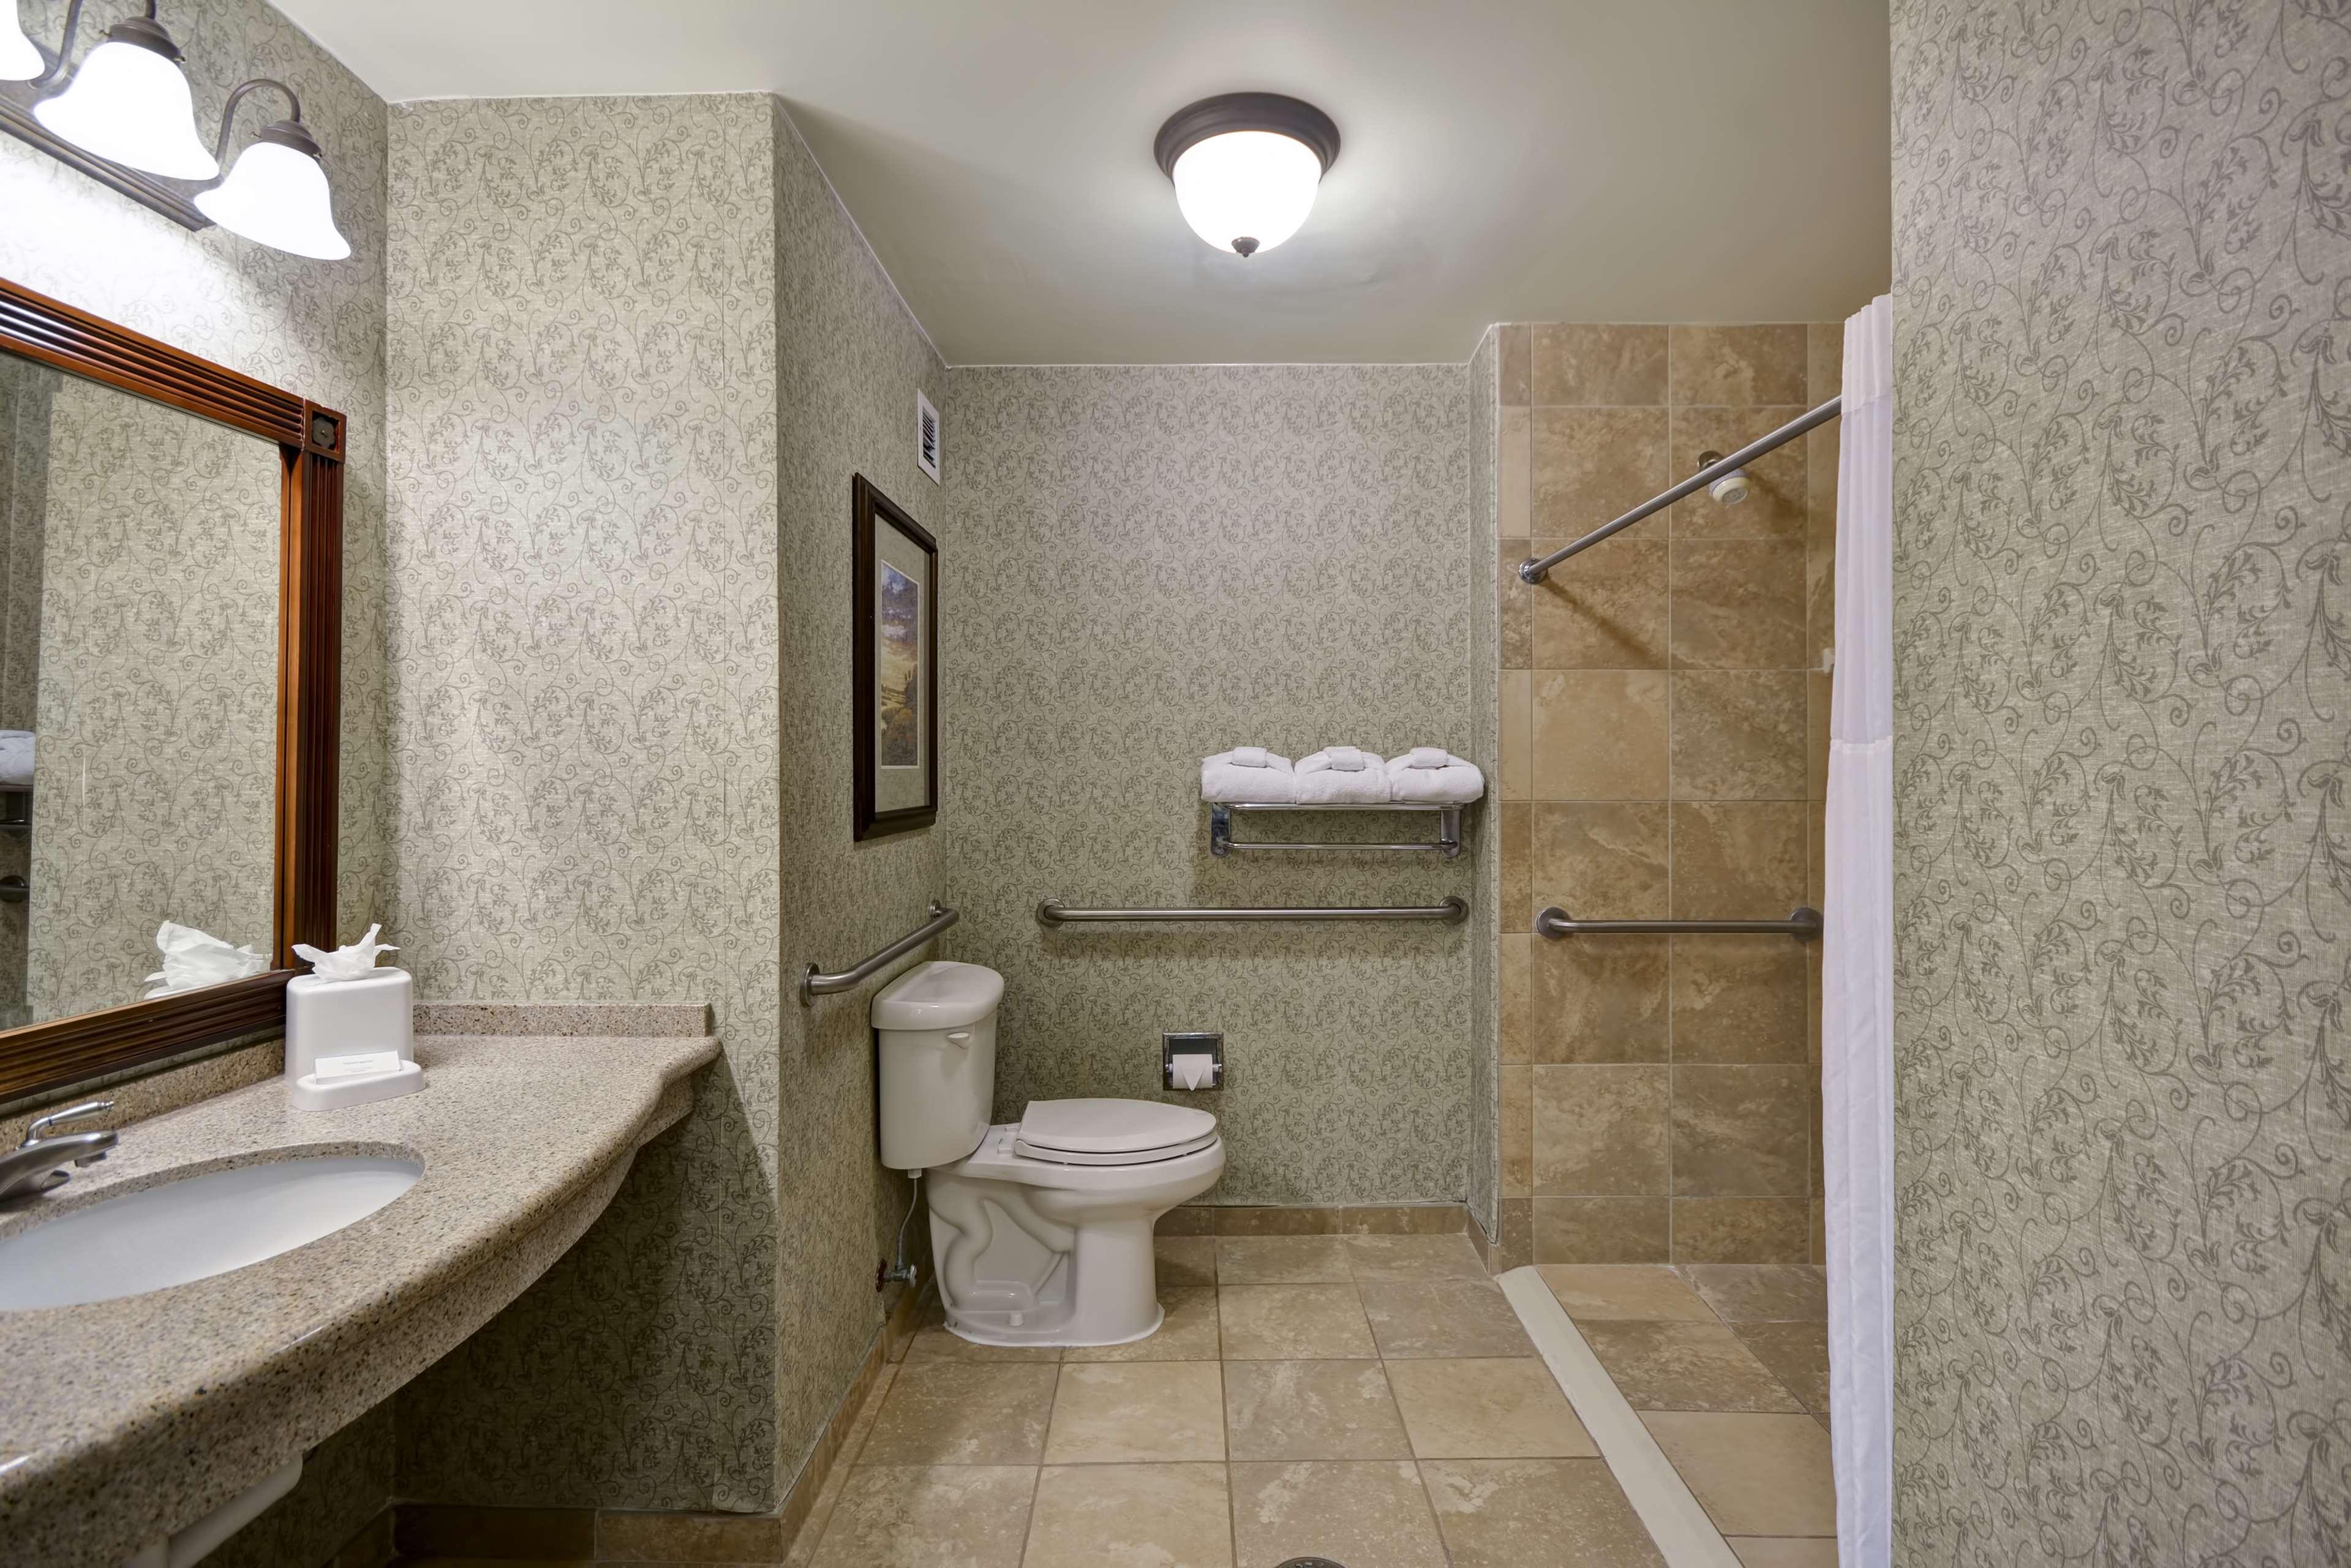 Hampton Inn & Suites Savannah Historic District image 28